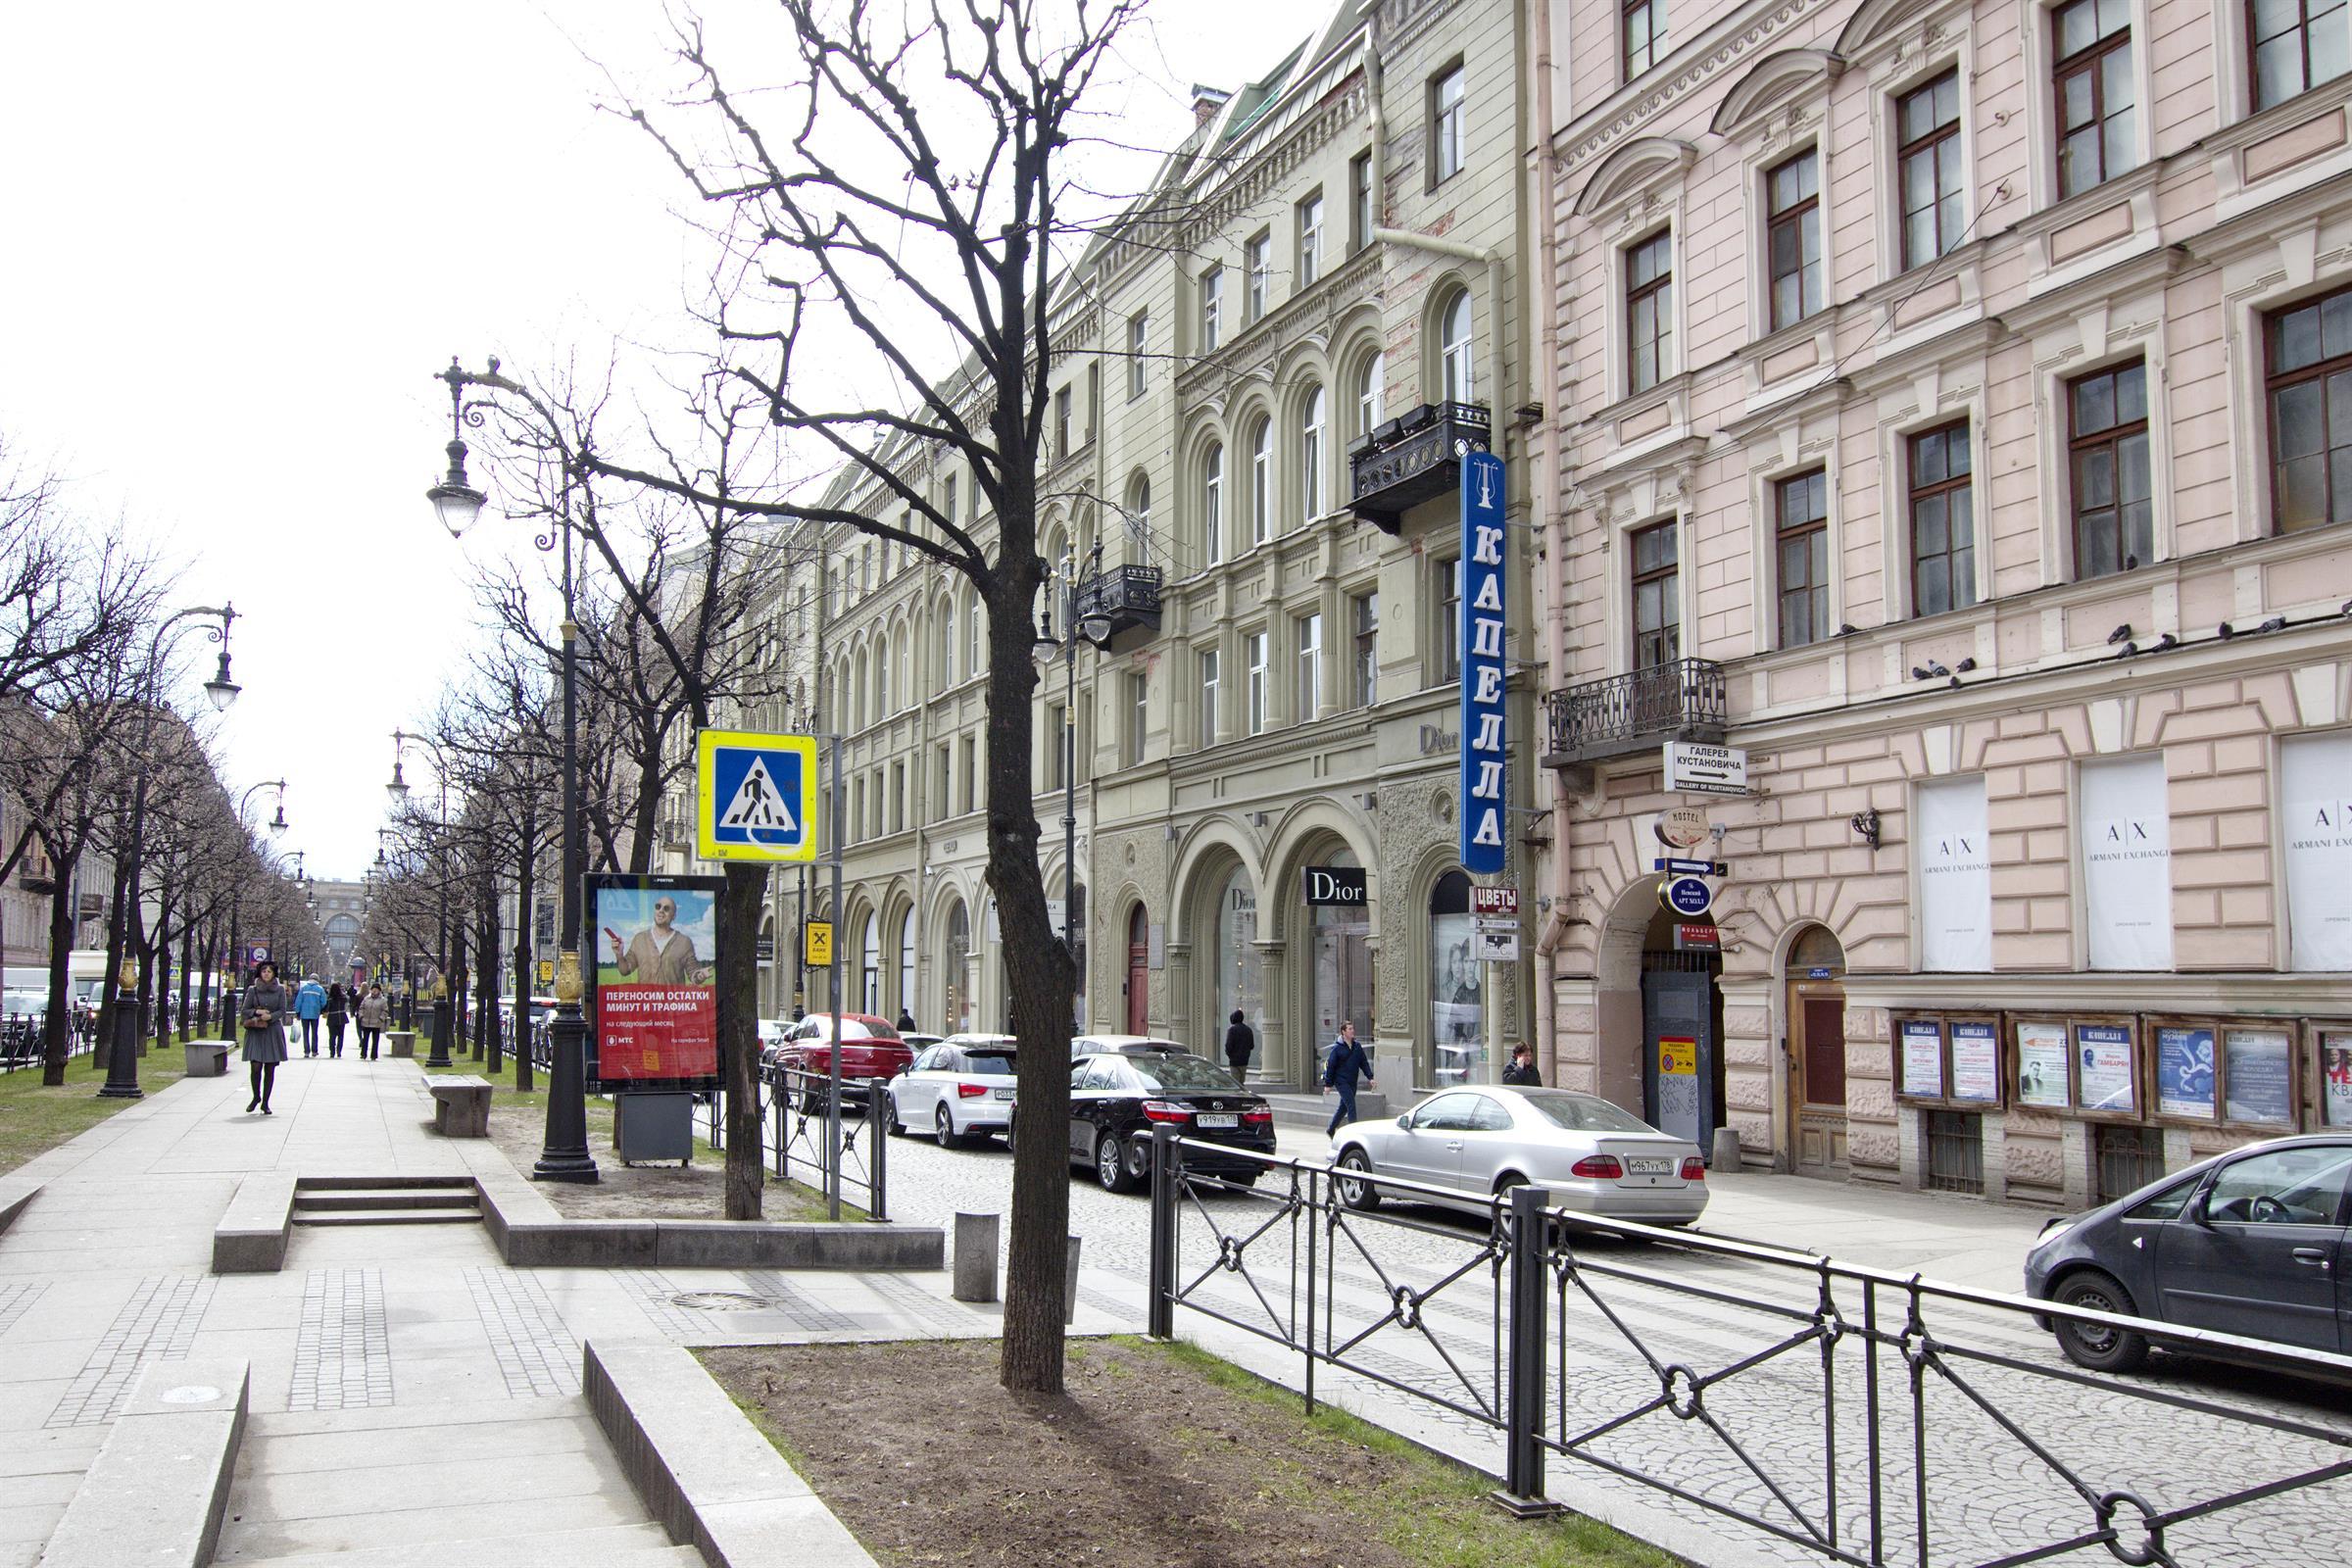 Nevsky_ArtHall_Fassade.jpg